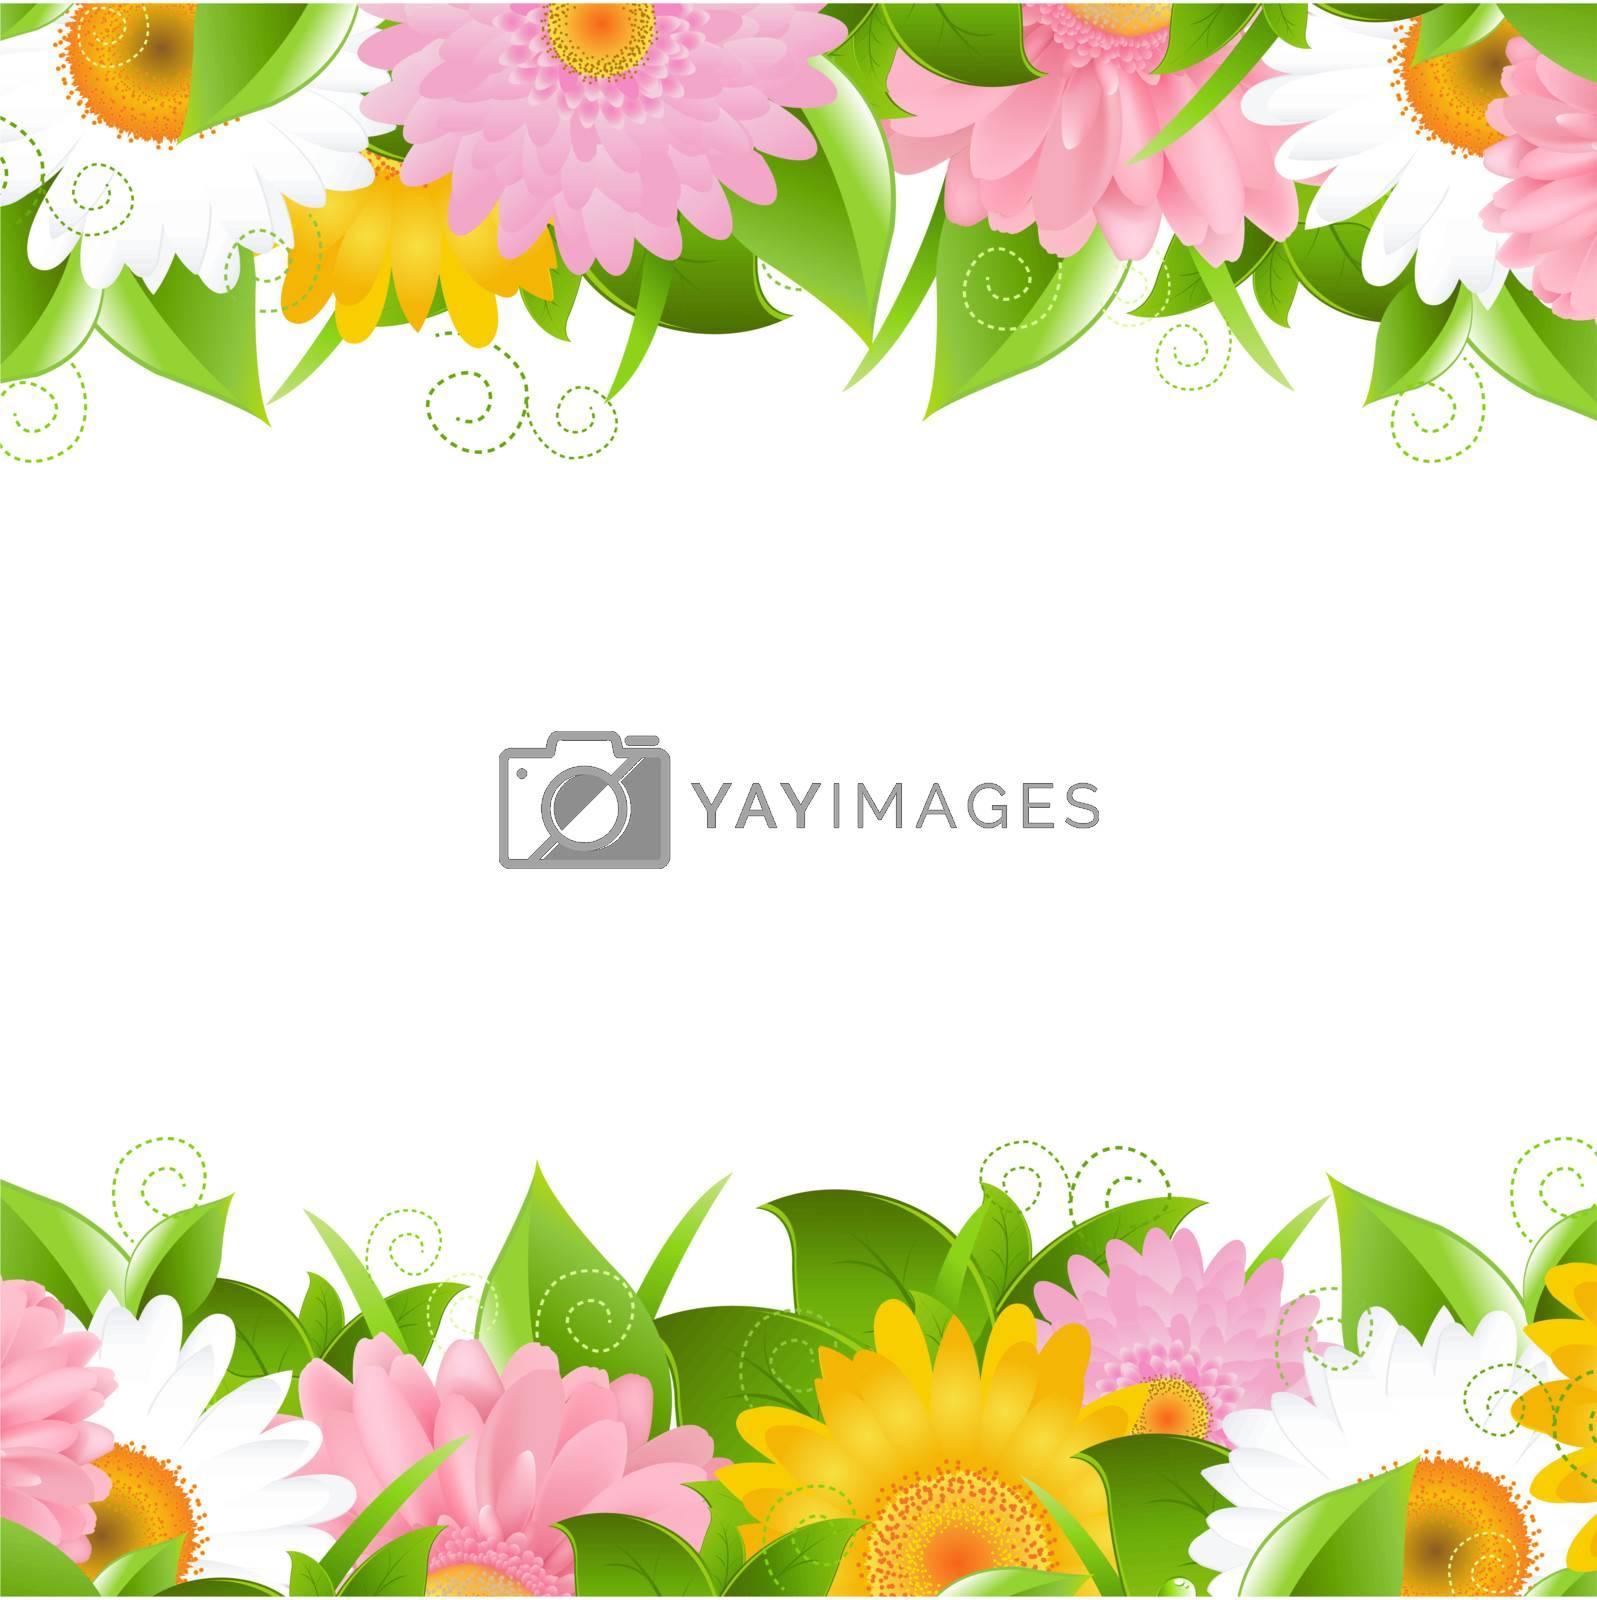 Flower And Leaves Border, Vector Illustration